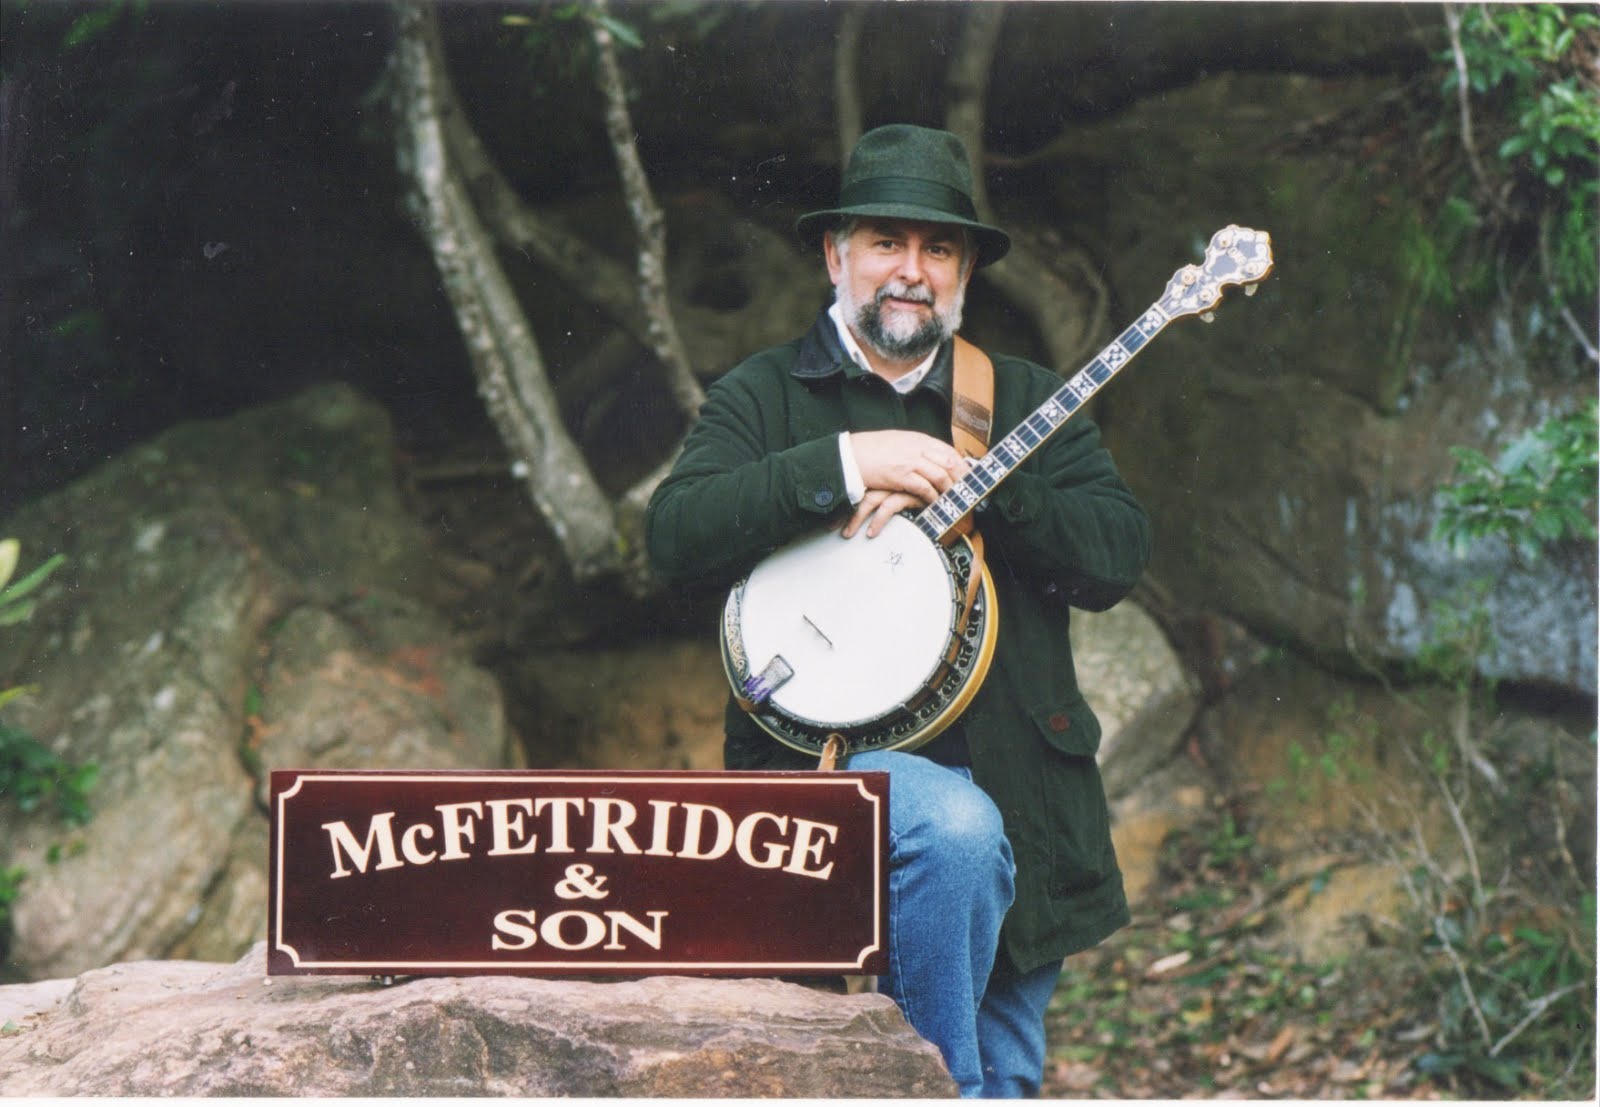 Gary McFetridge